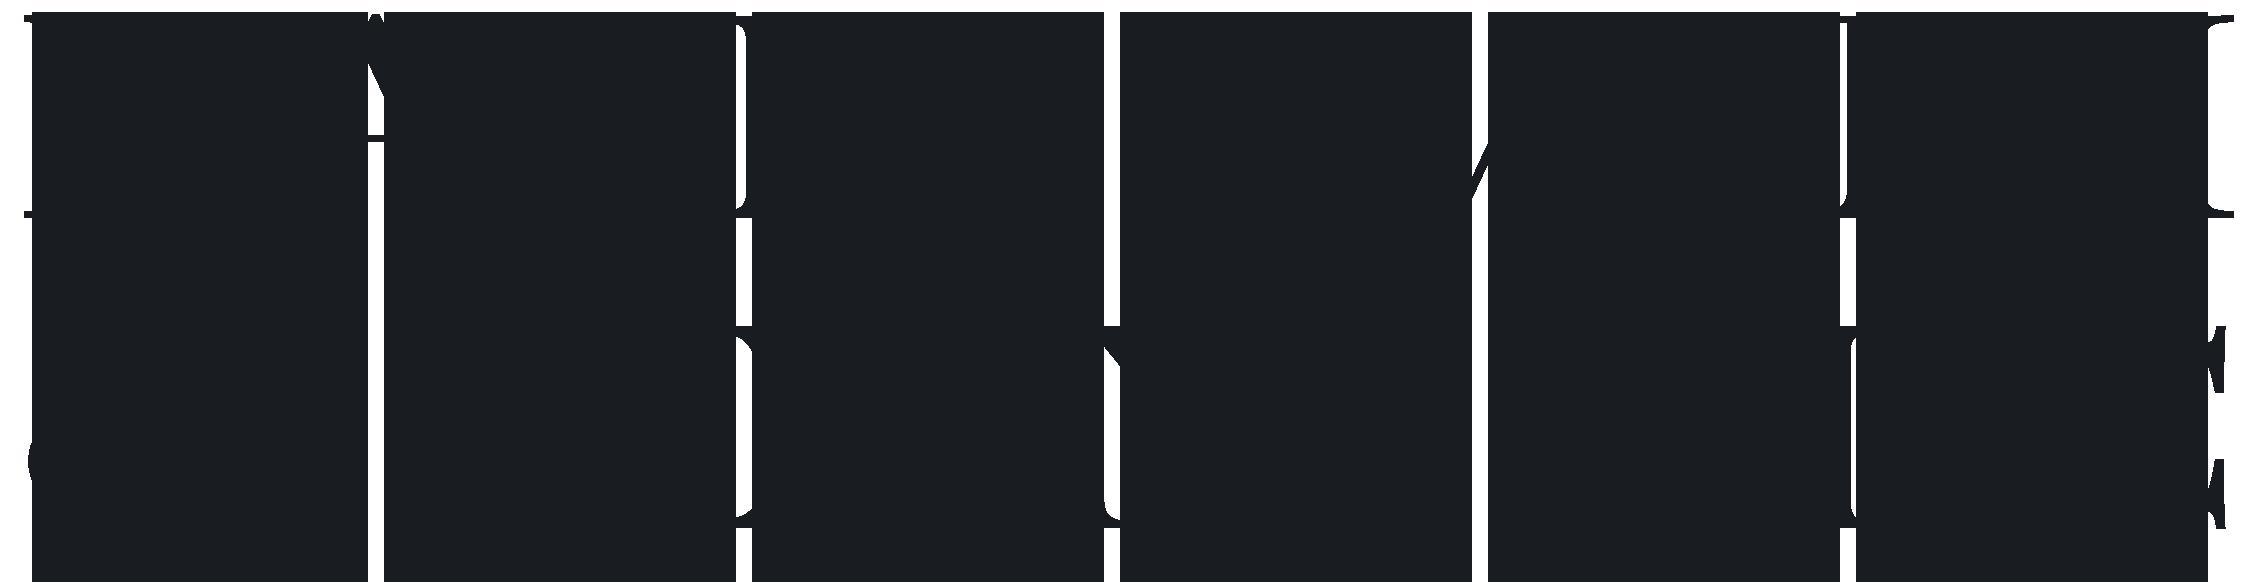 Davis Smith & Jean, LLC